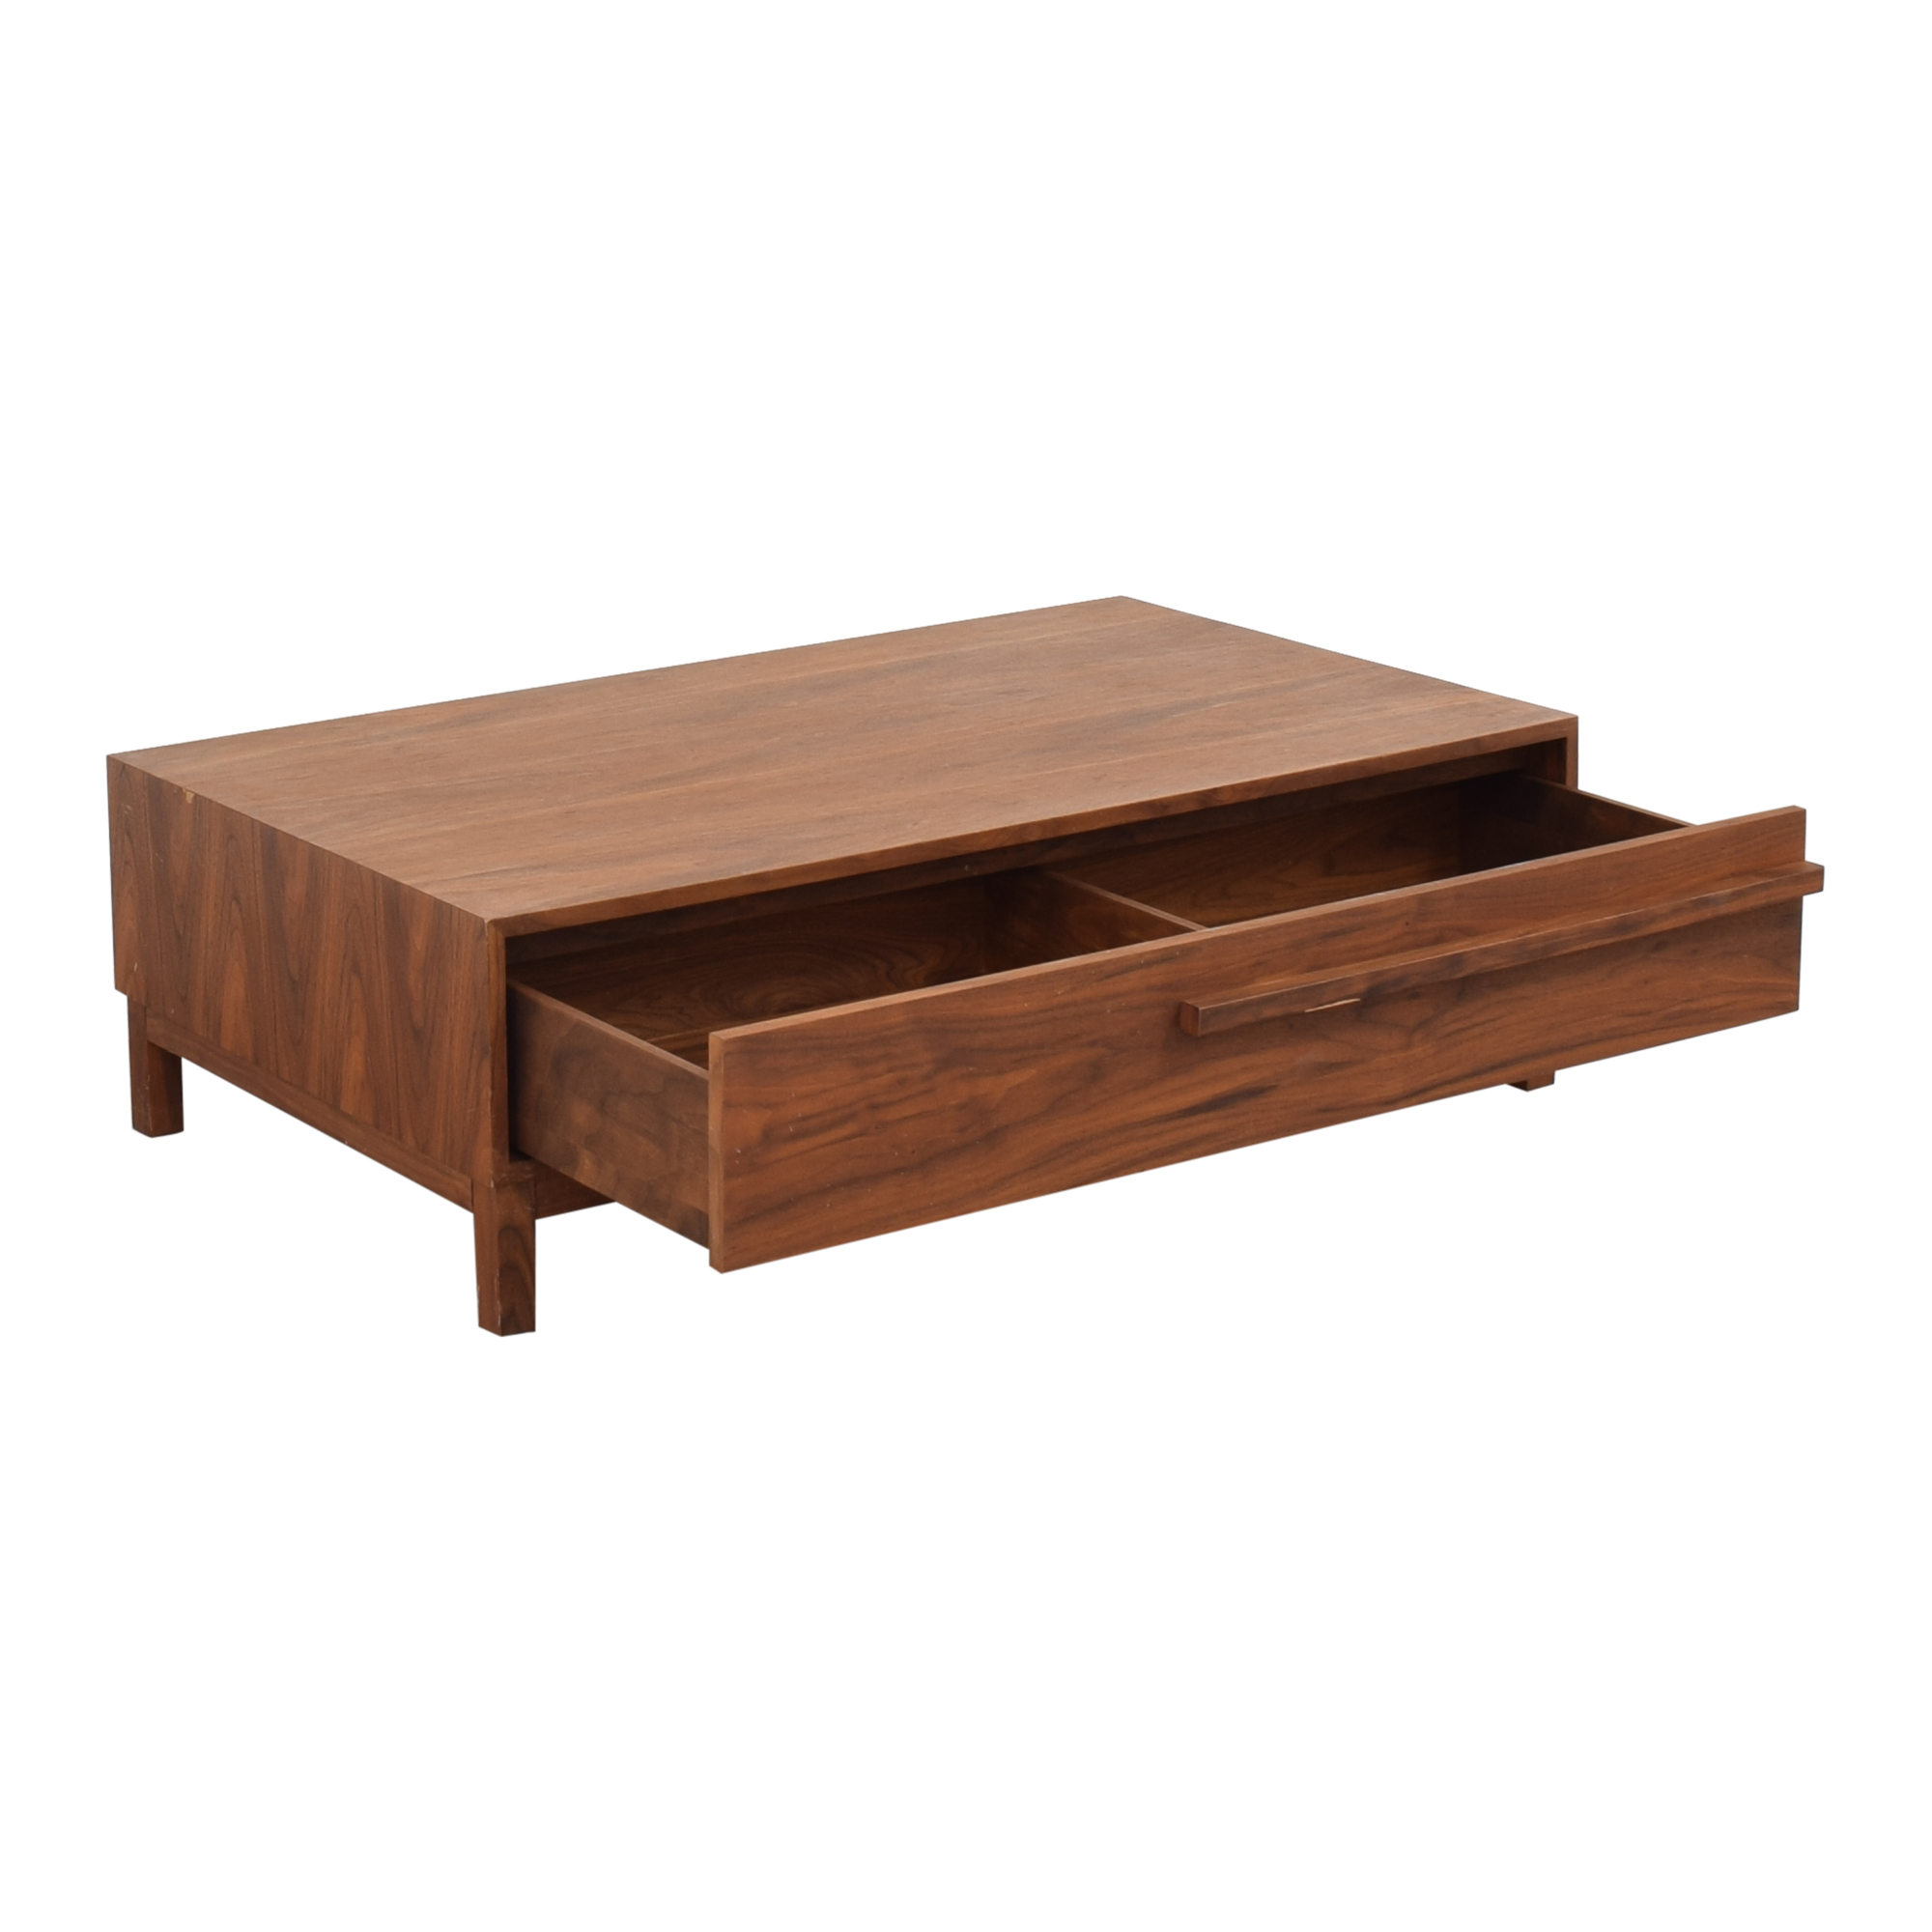 Crate & Barrel Crate & Barrel Storage Coffee Table pa